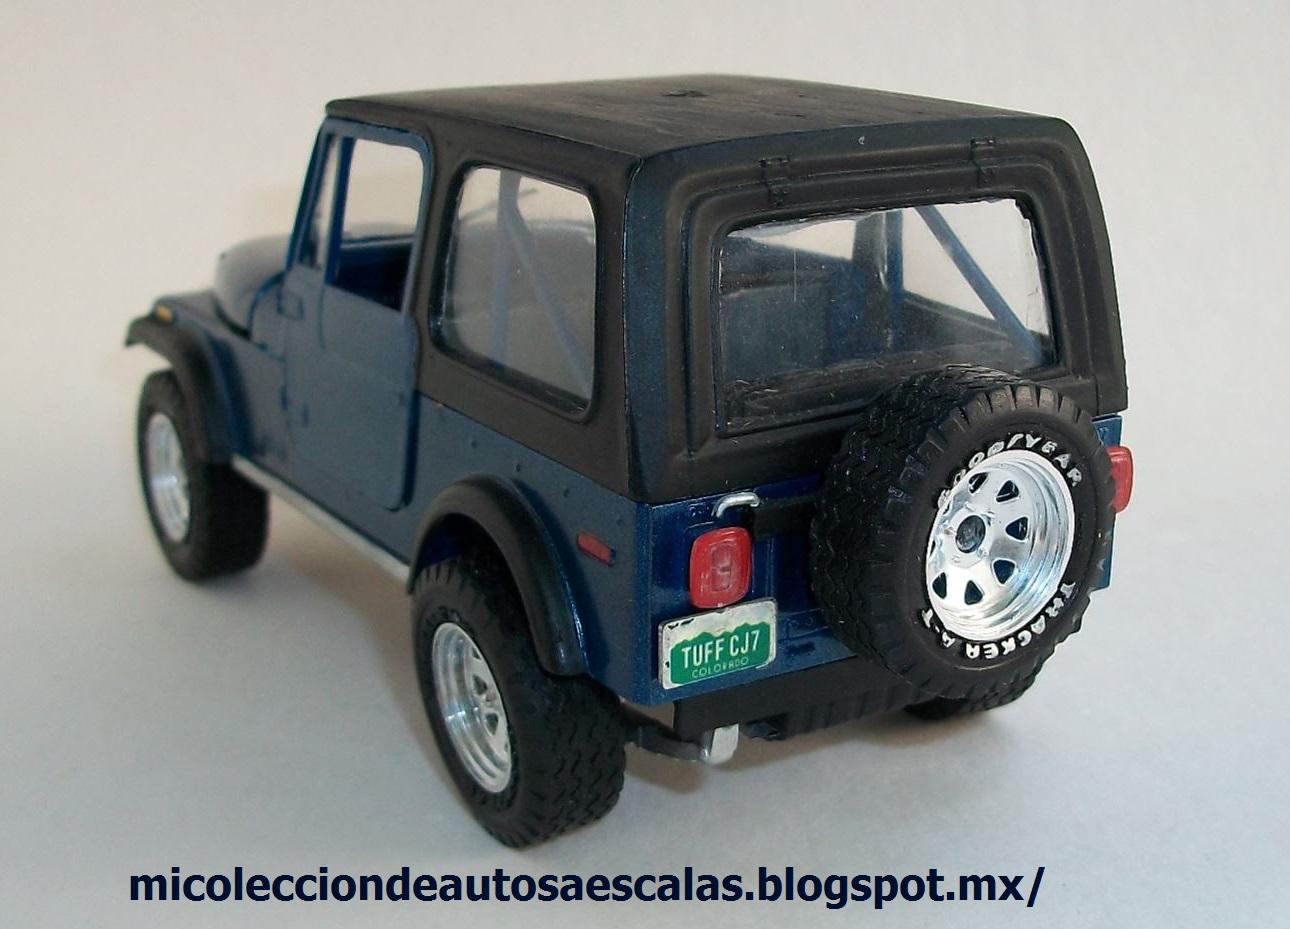 Gemütlich 1977 Jeep Galerie - Verdrahtungsideen - korsmi.info